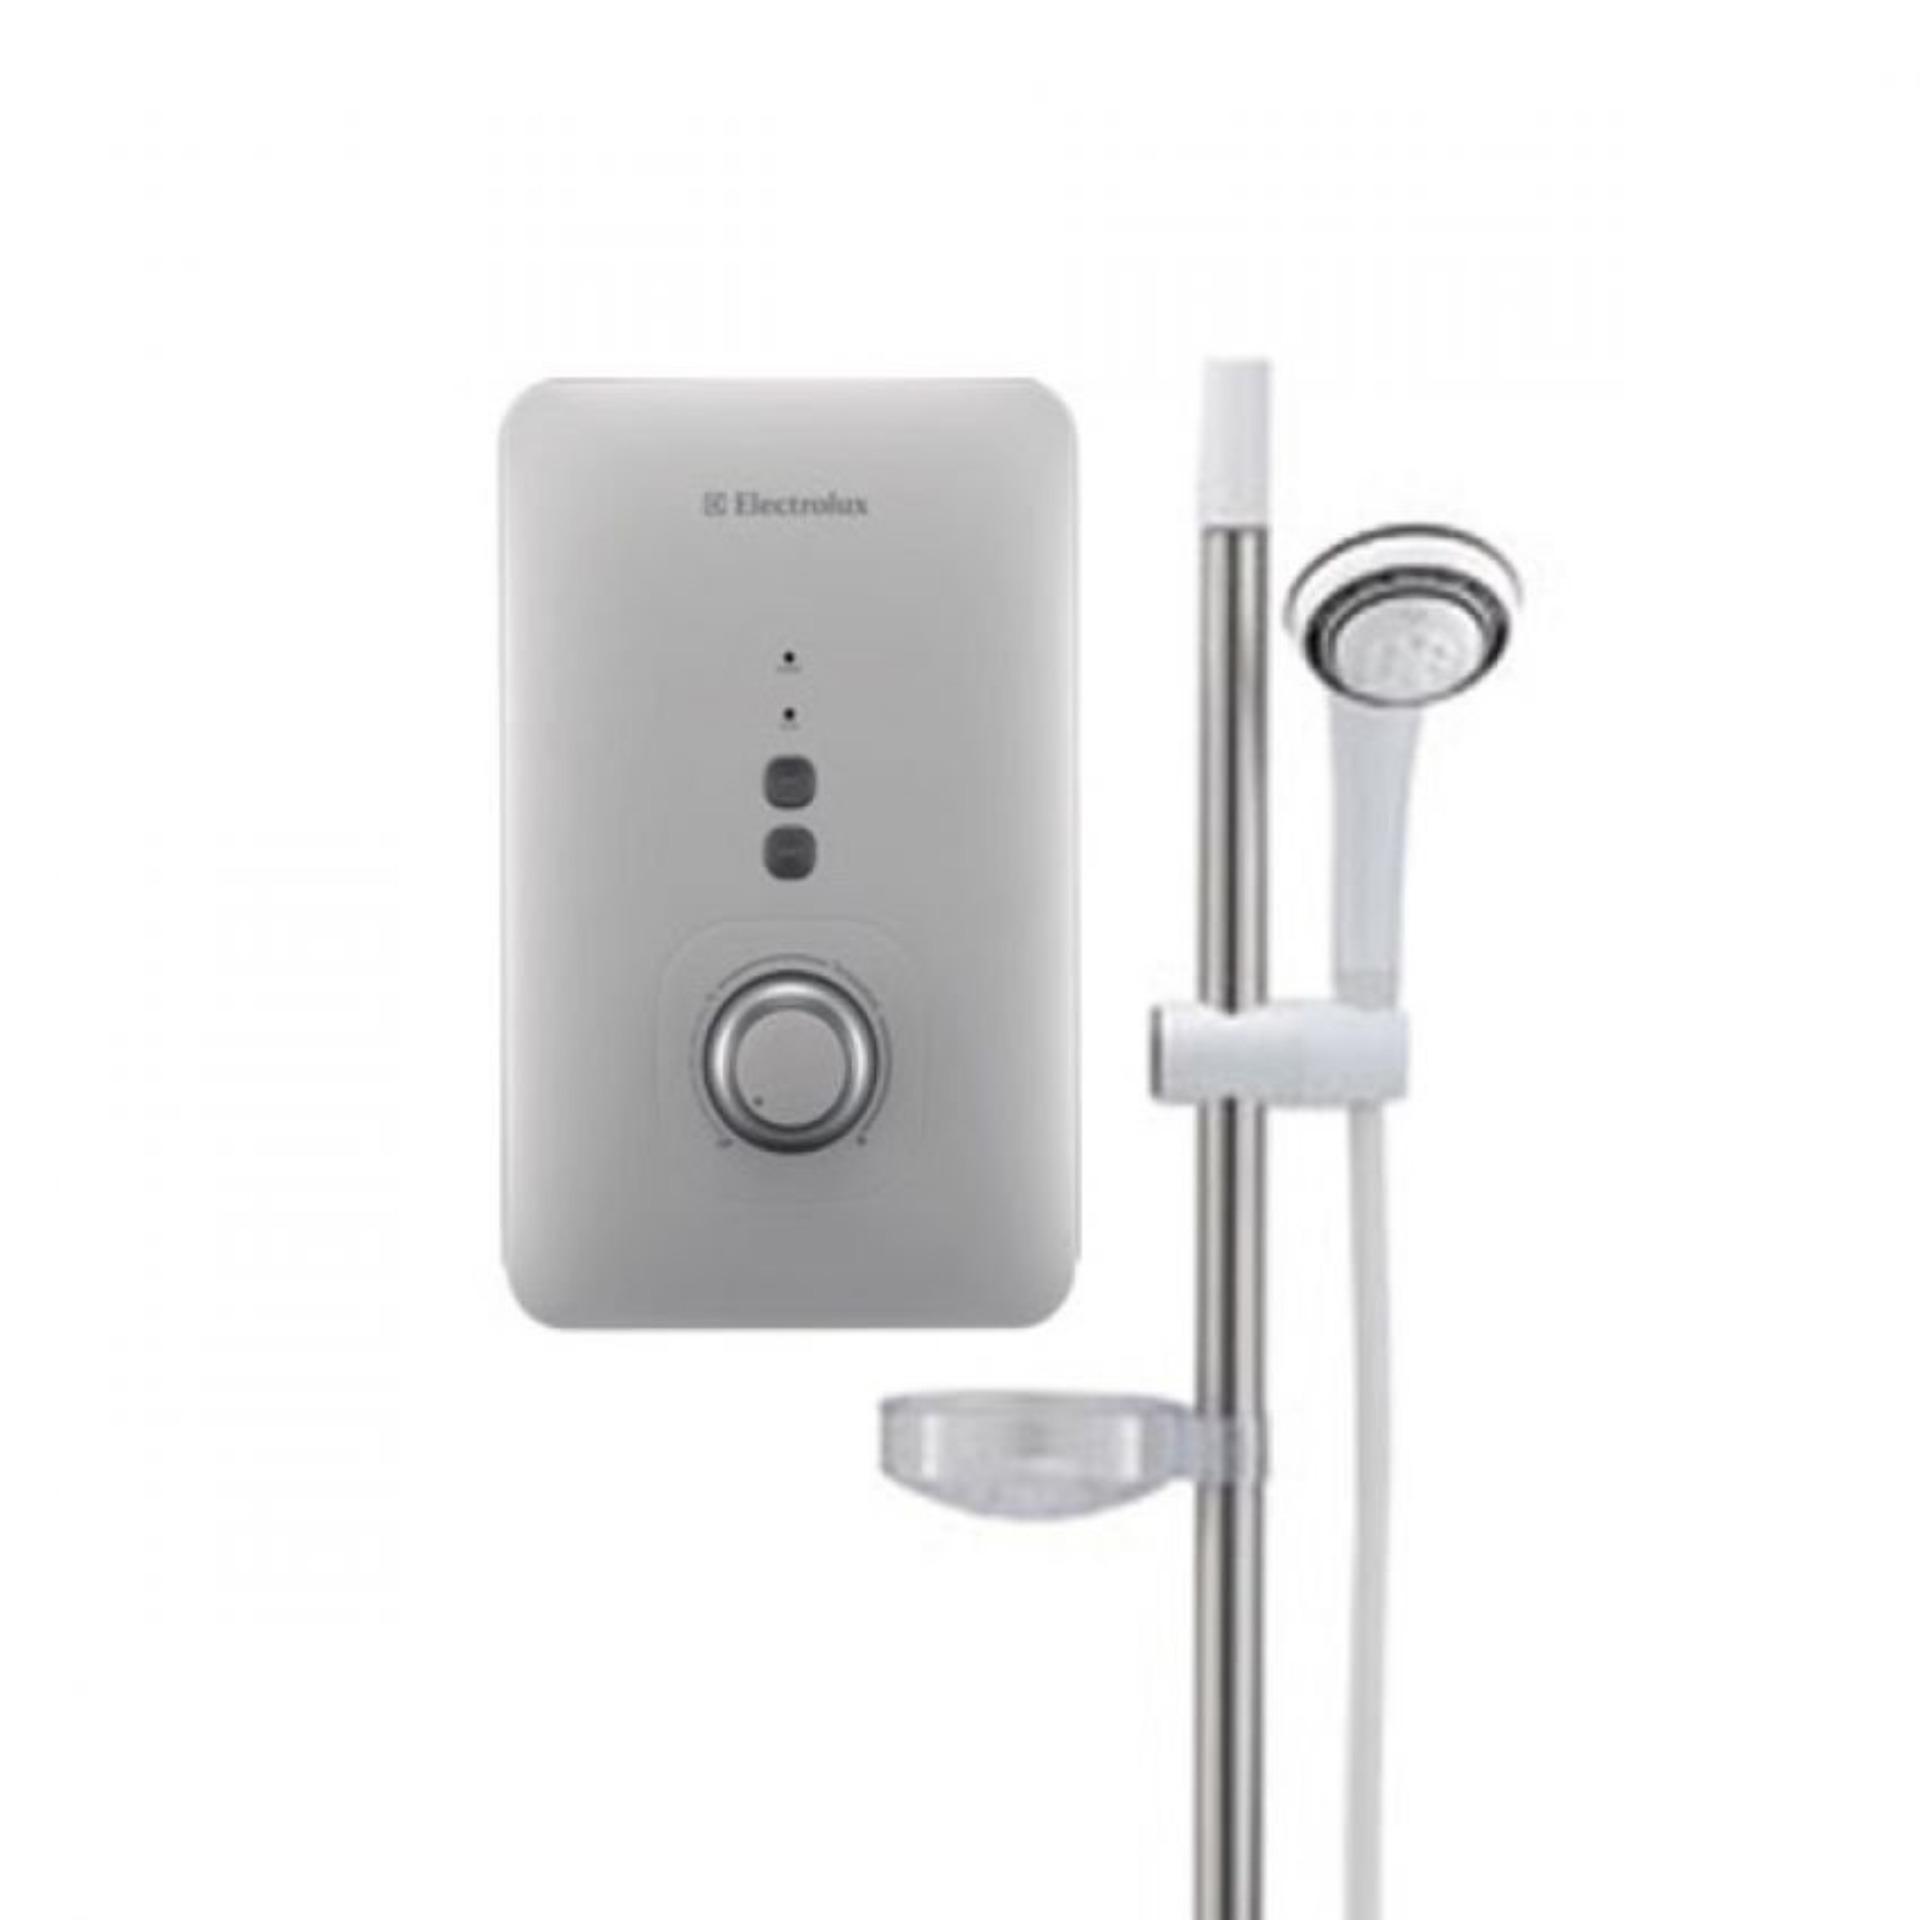 Bandingkan Simpan Water Heater Electrolux Ewe 241 Ax Sw Modena Pemanas Air Circolo Es 30h